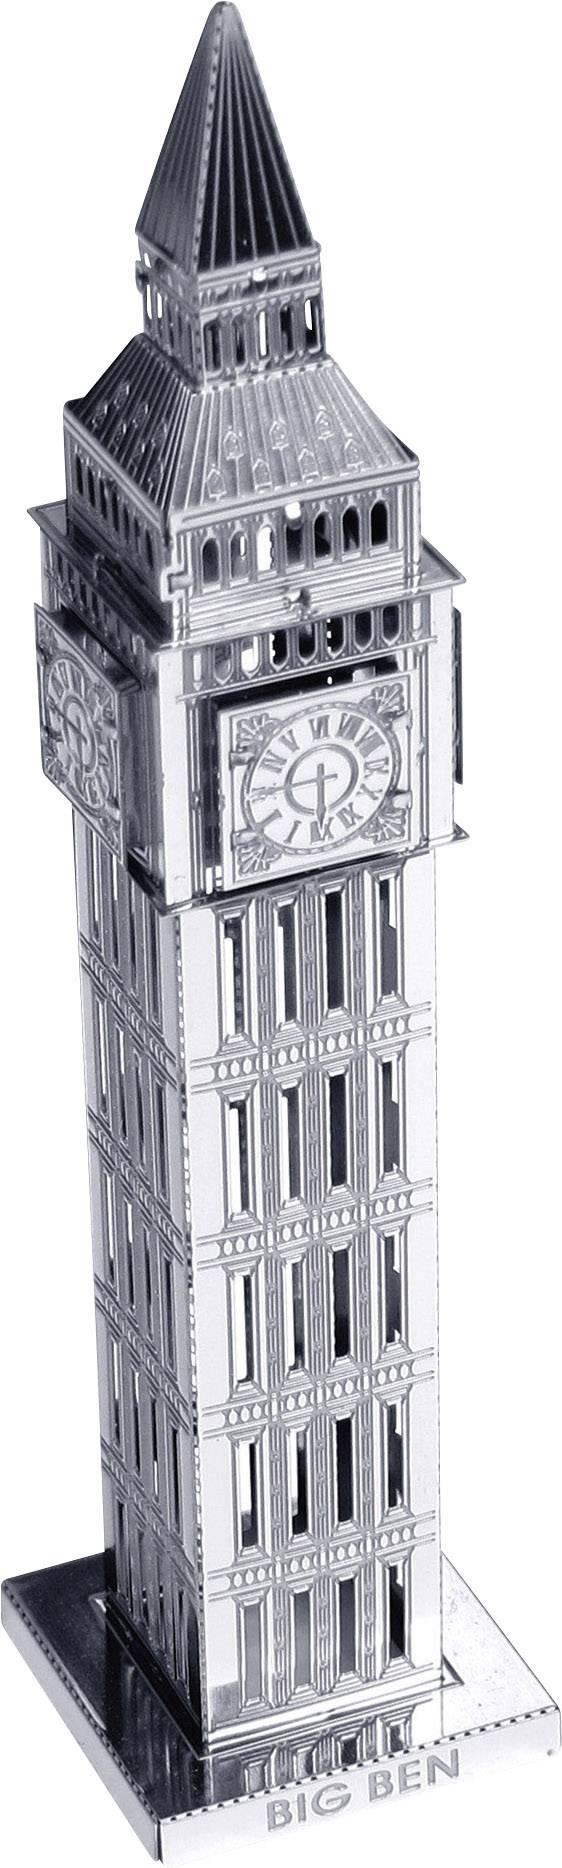 Stavebnica Metal Earth Big Ben Tower